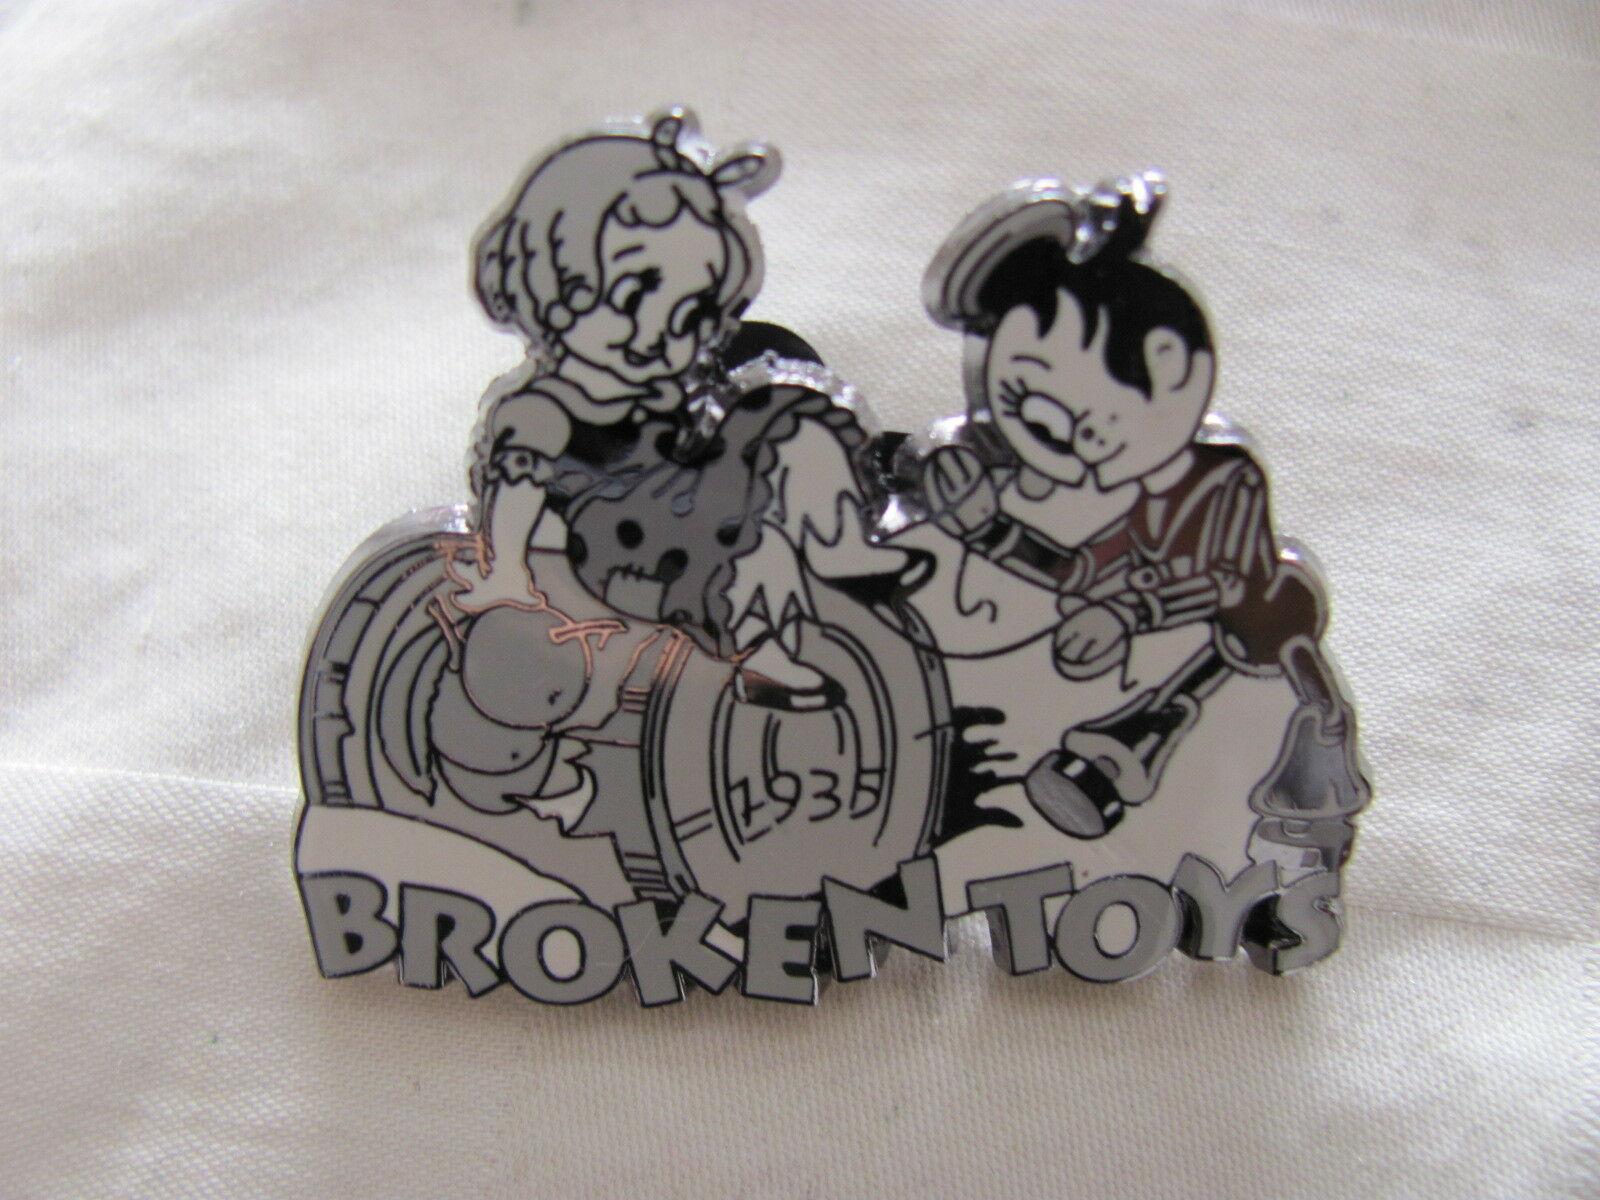 Disney Trading Pins  8502 100 Years of Dreams #91 - Broken Toys - $7.70